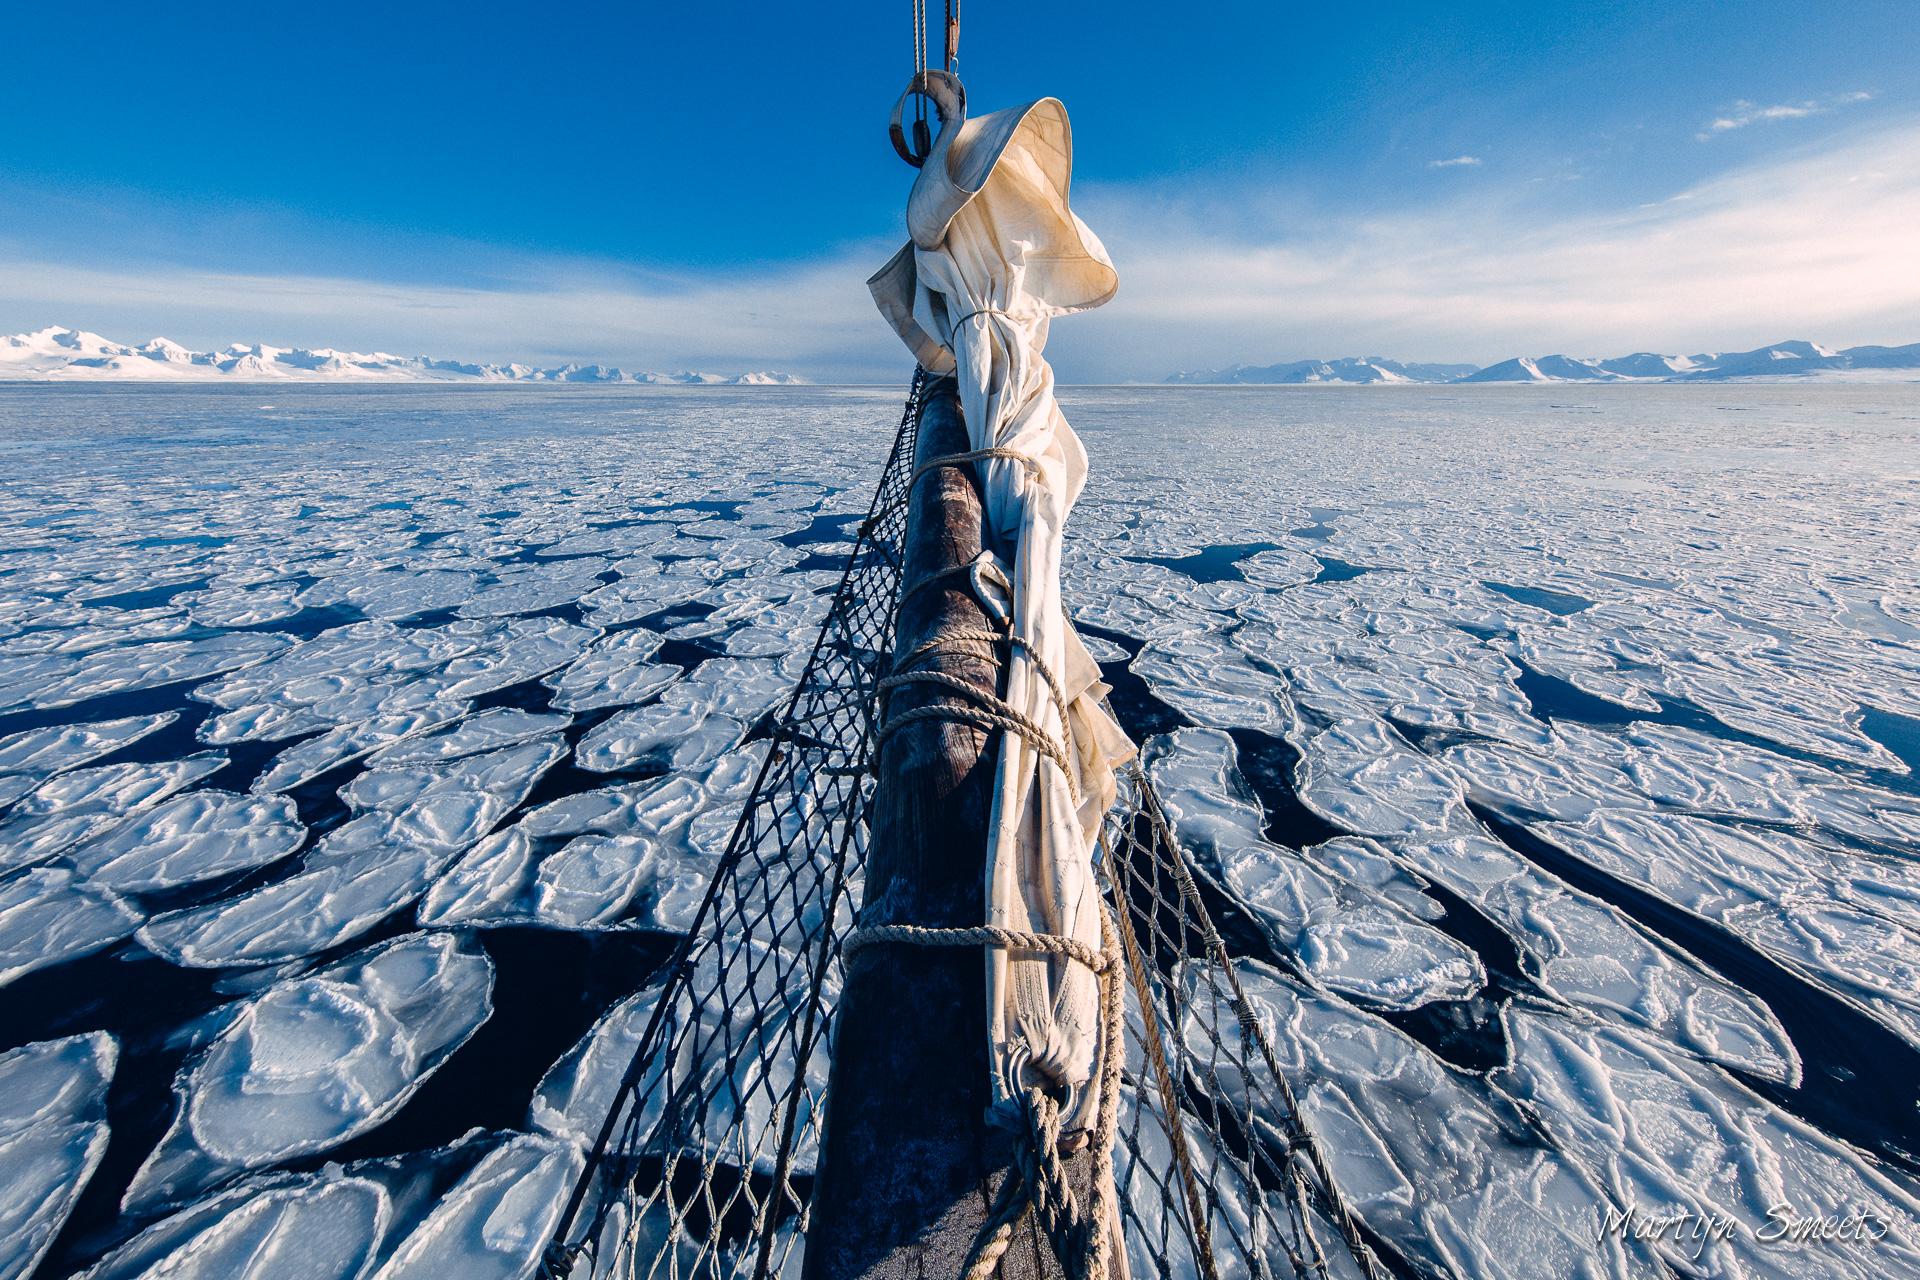 De boegspriet van zeilschip Noorderlicht boven 'pancake ice' in Forlandsundet, Spitsbergen